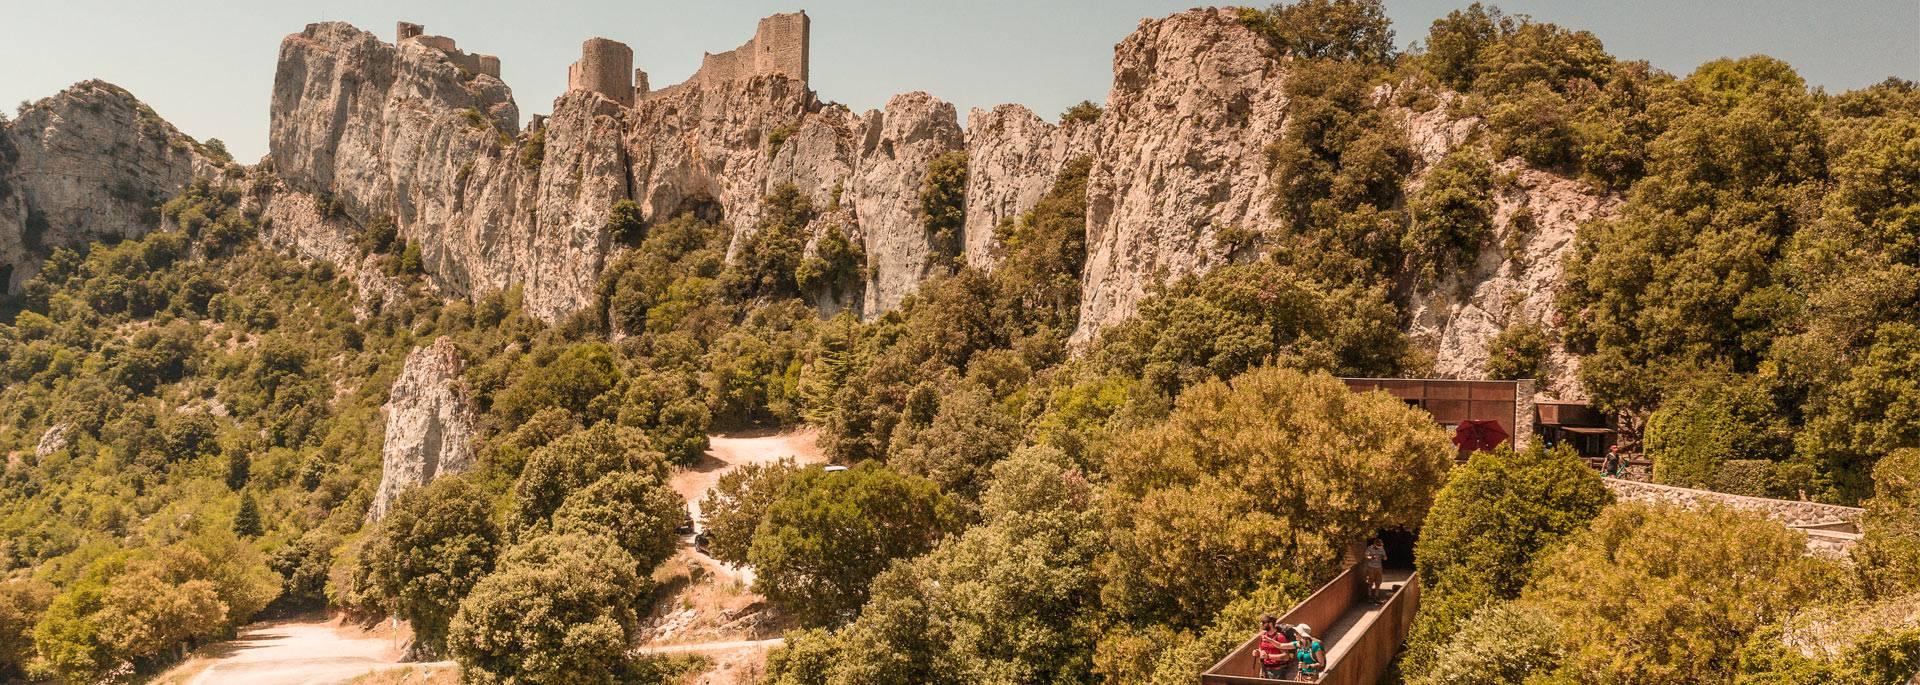 Visiting the Peyrepertuse's castle